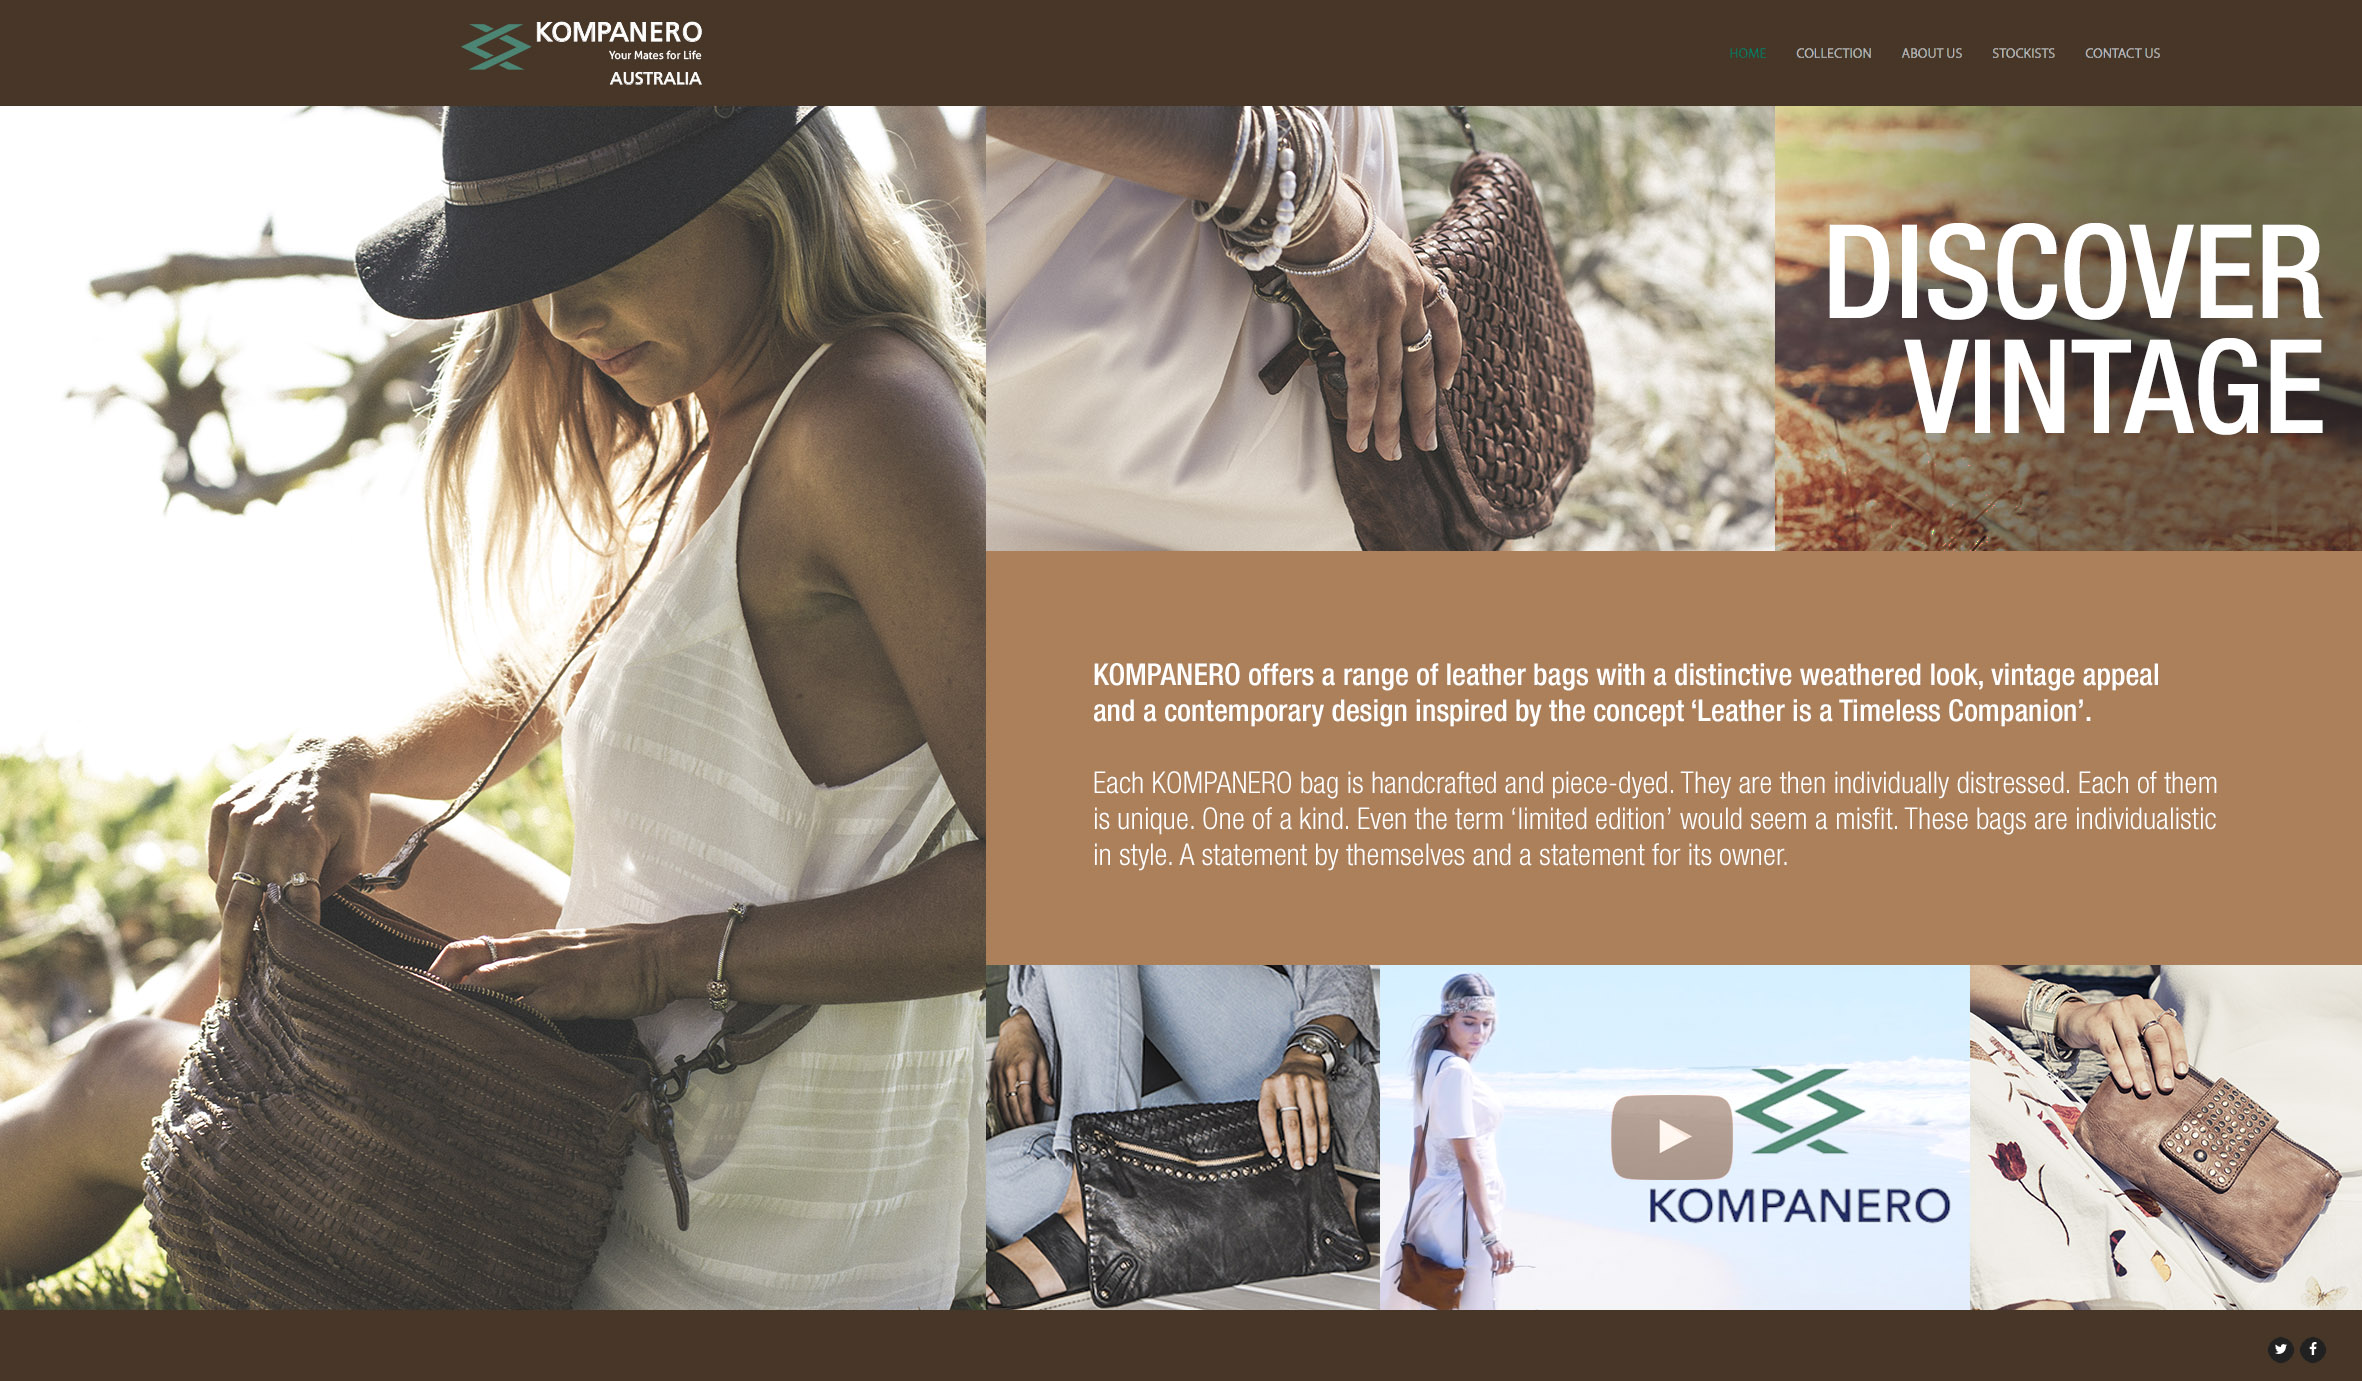 Kompanero Australia website launch